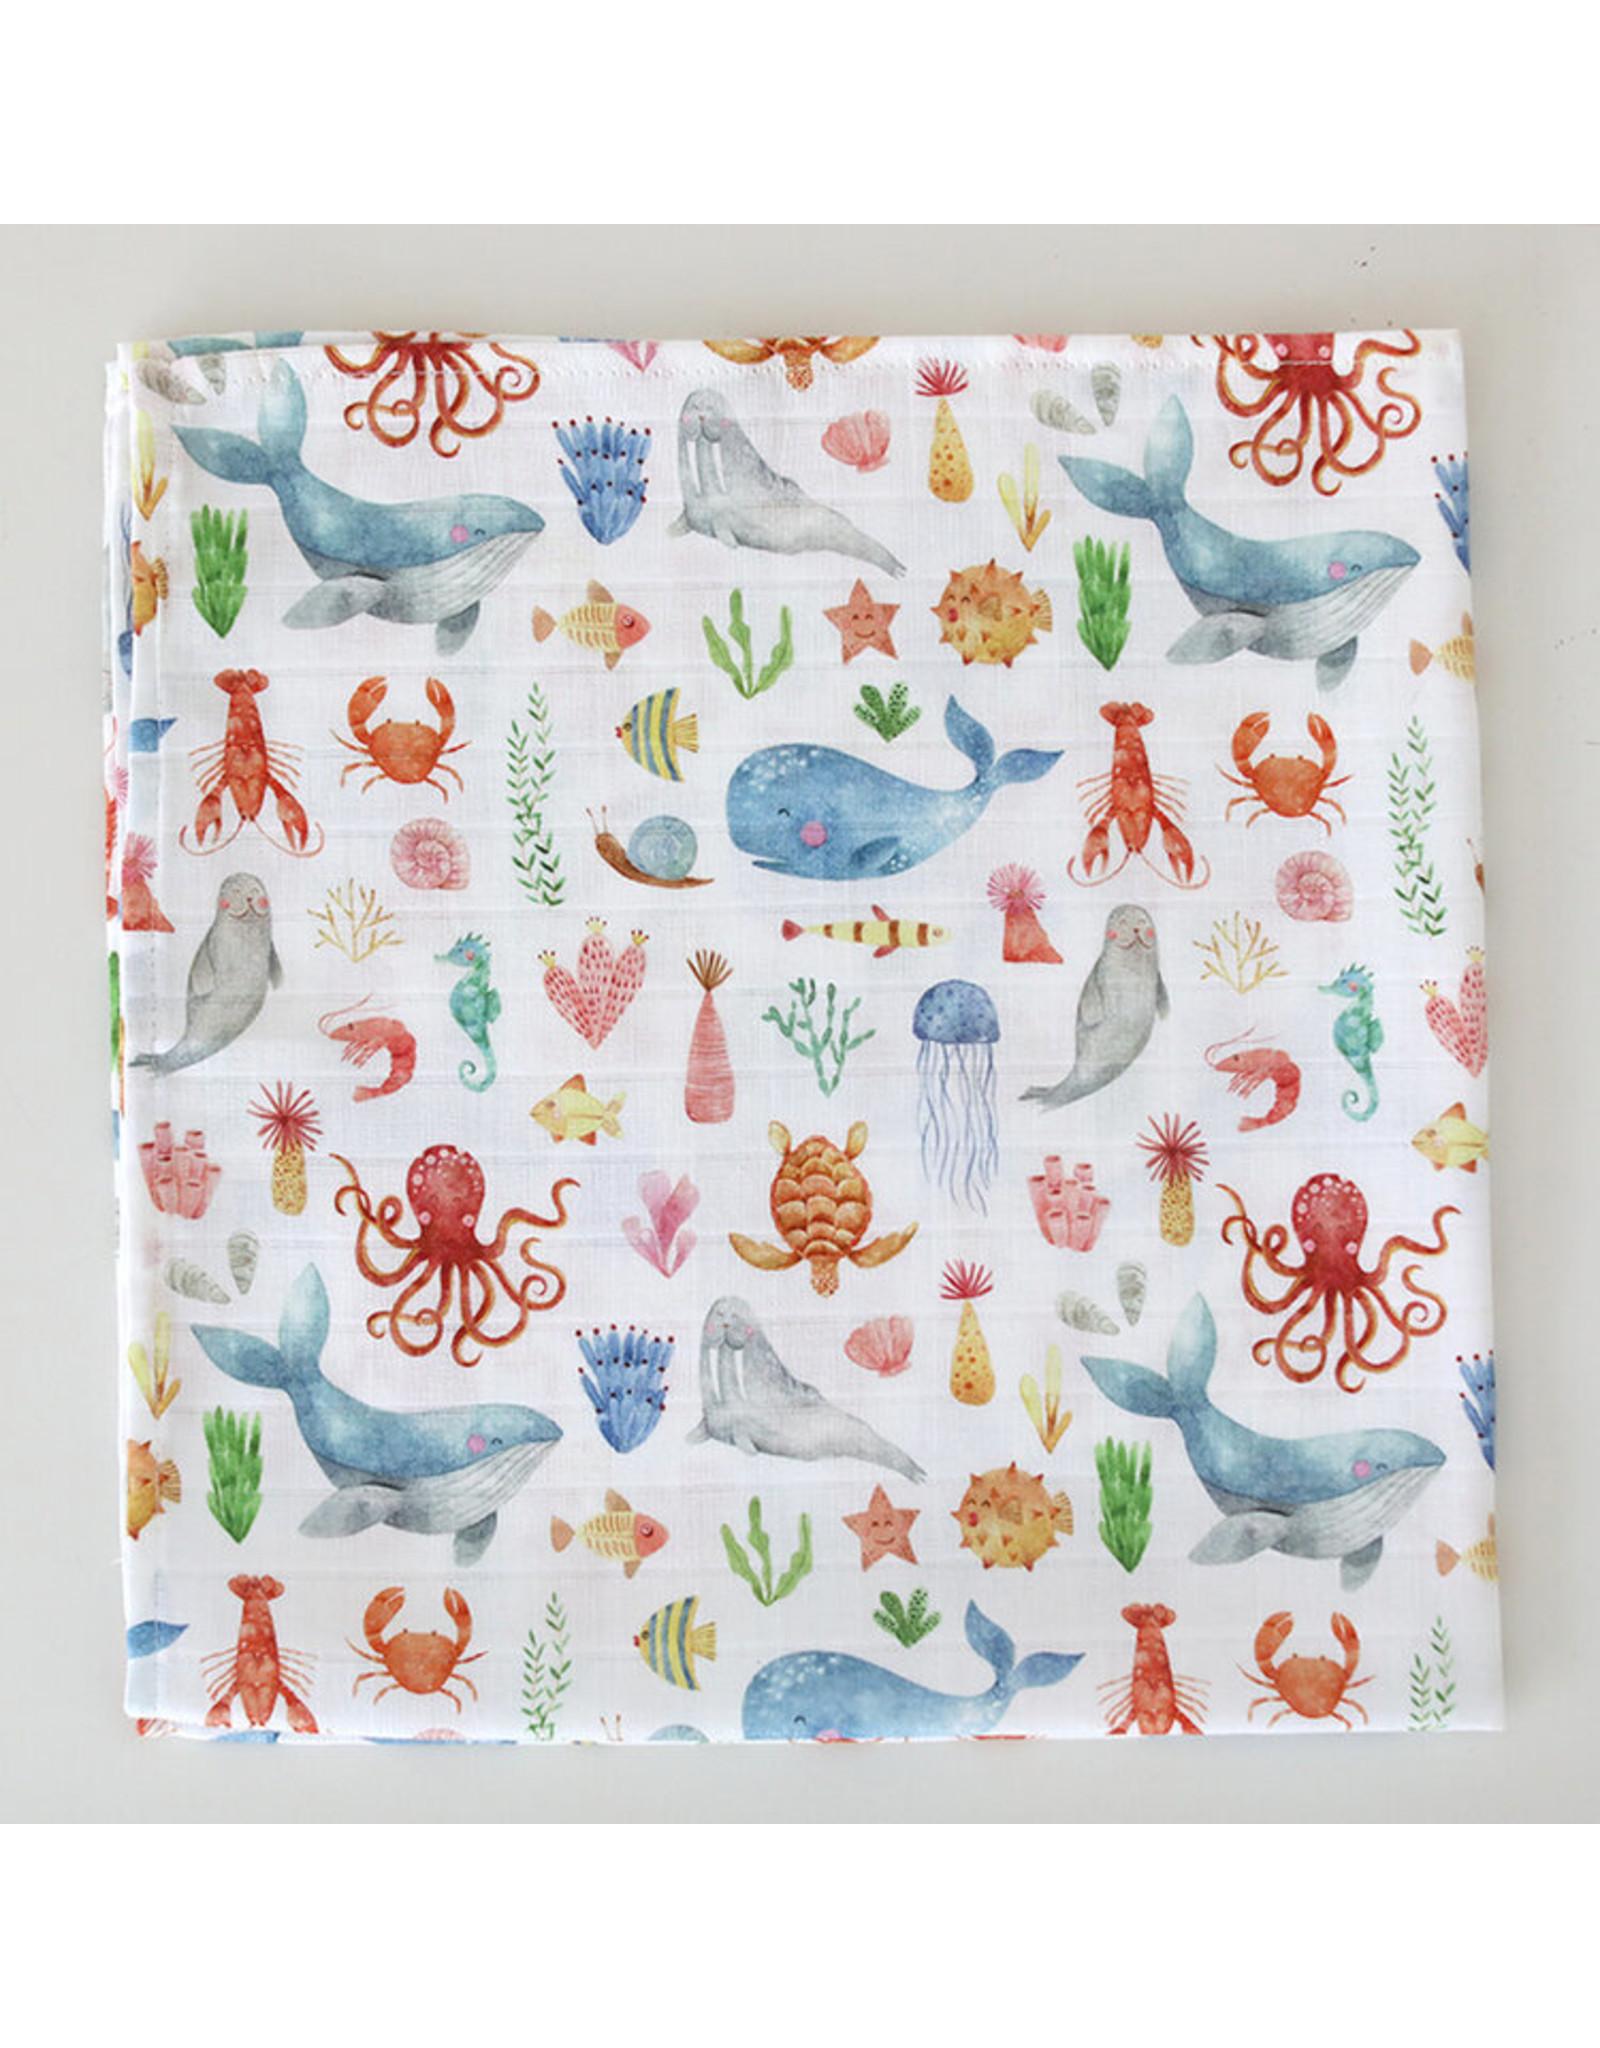 Fox in the Attic Muslin Swaddle Blanket -Sea Life